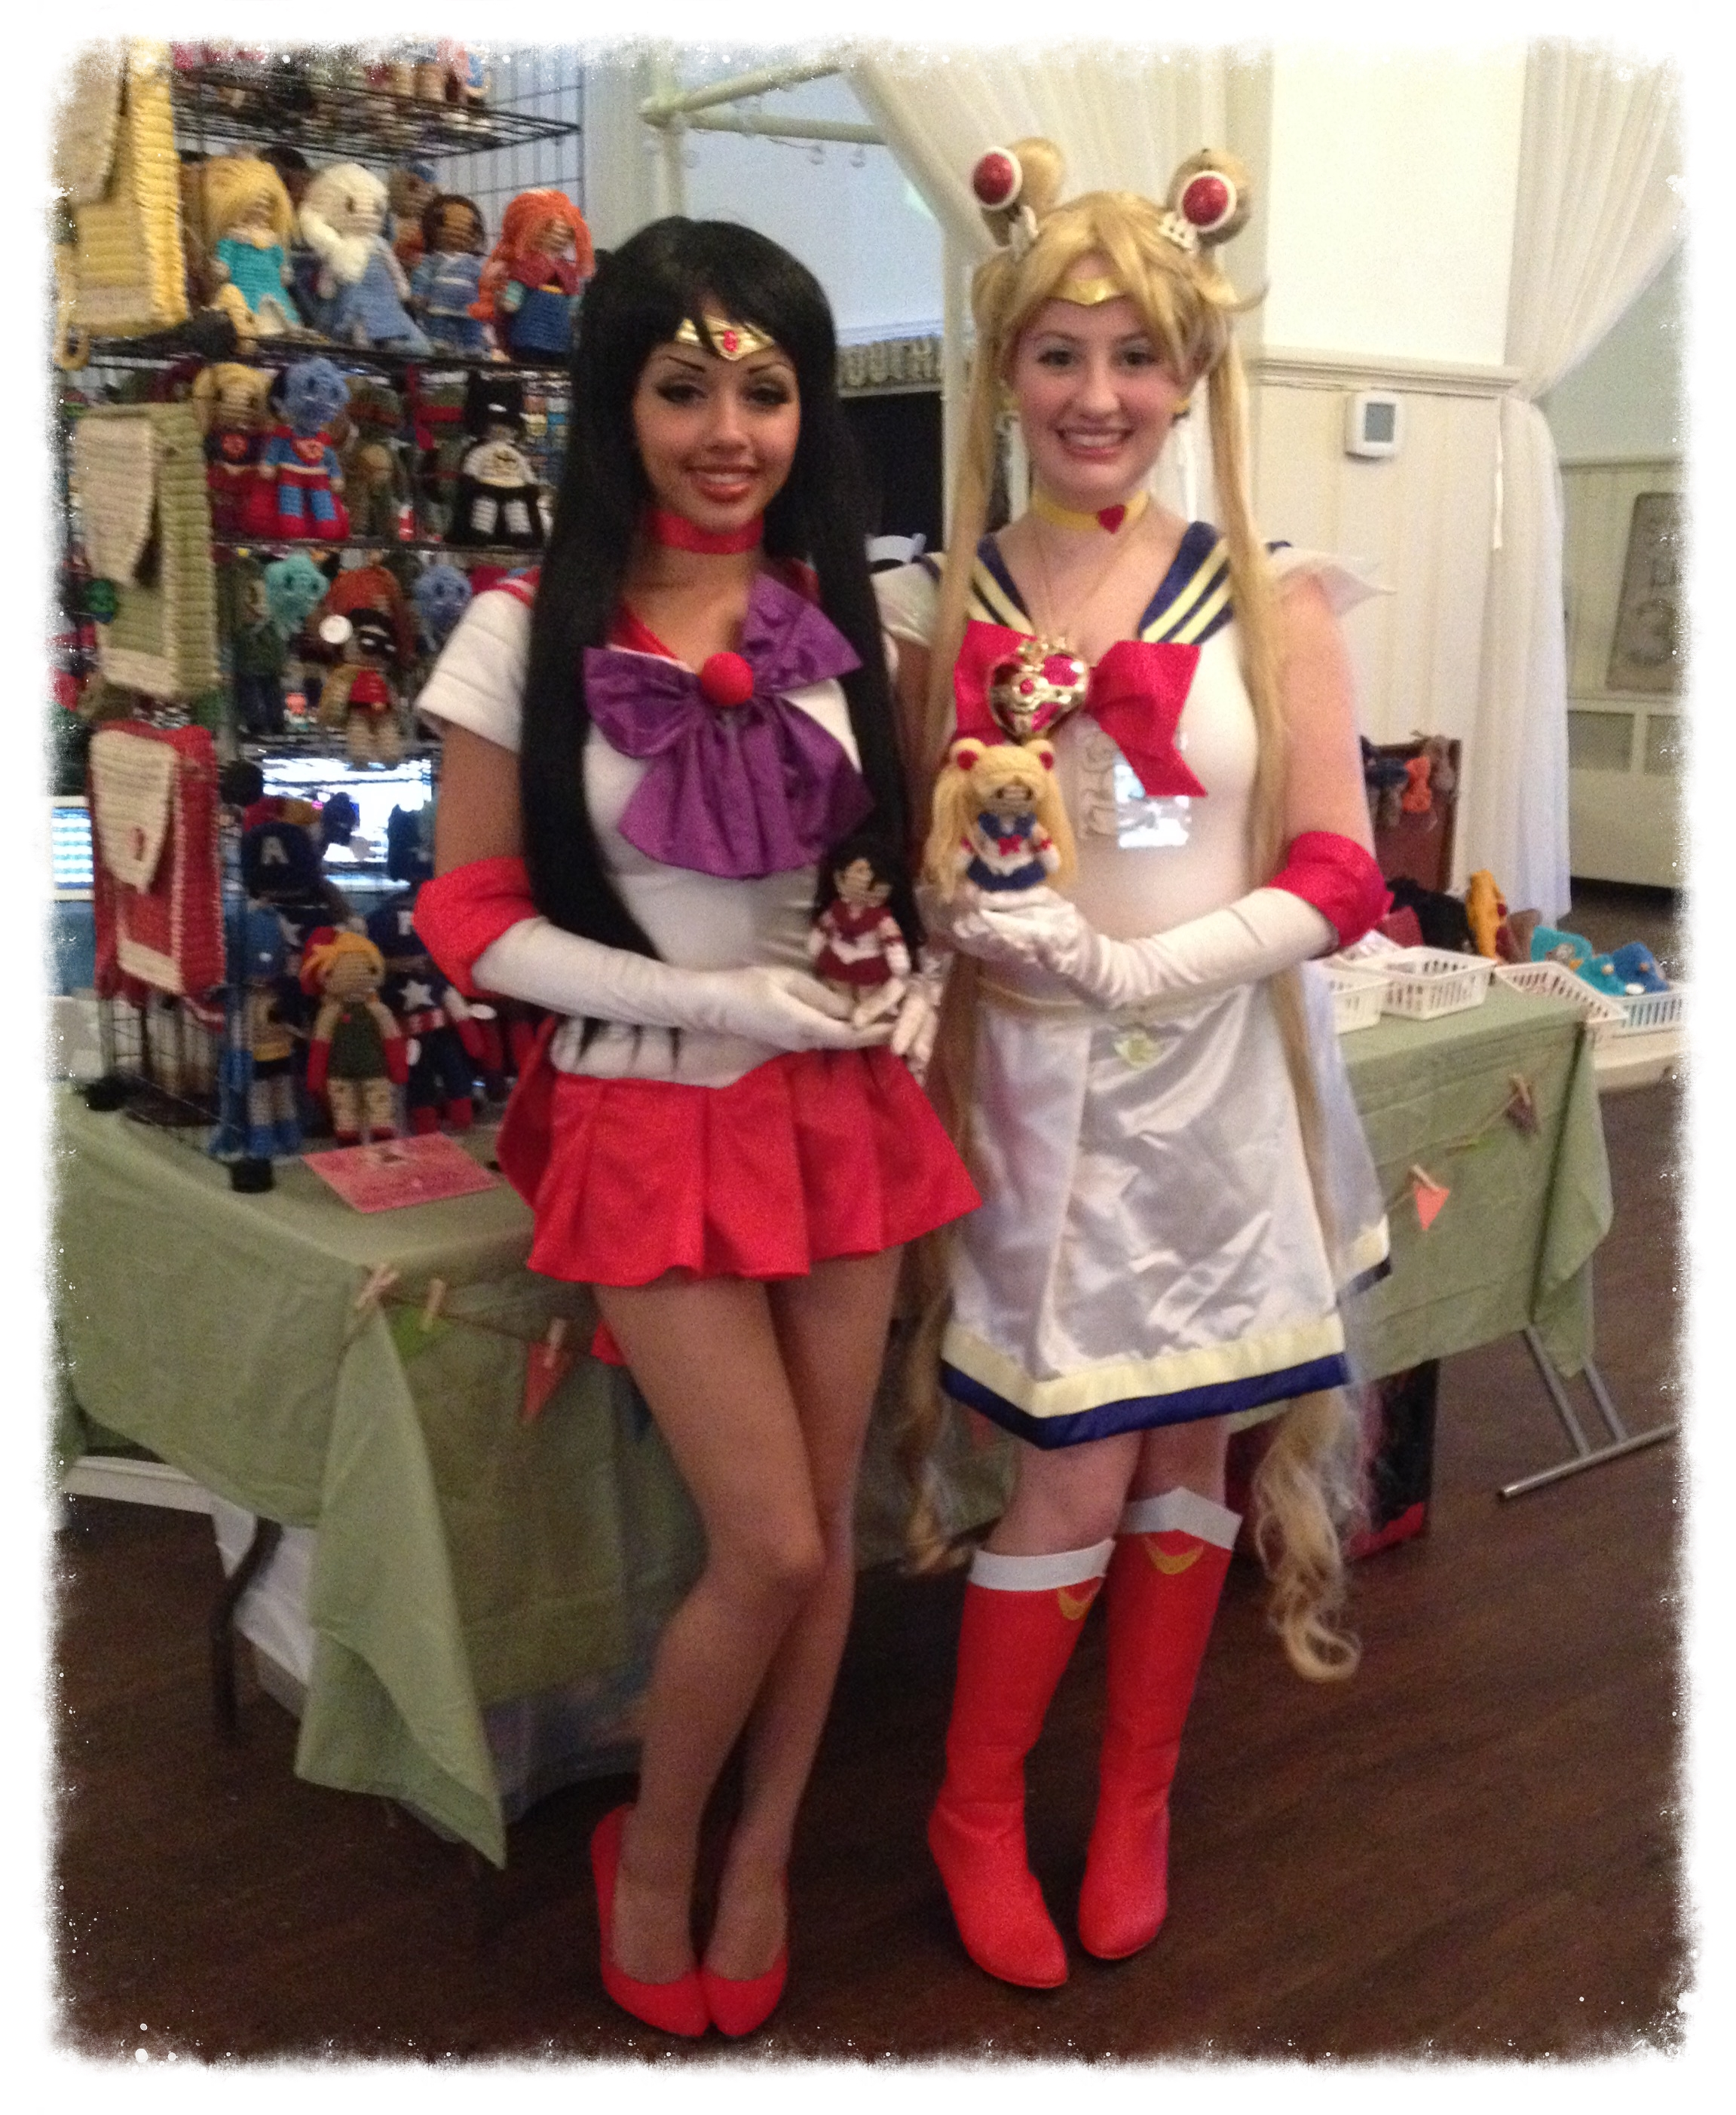 Keyana holding Sailor Mars & Nicole holding Sailor Moon